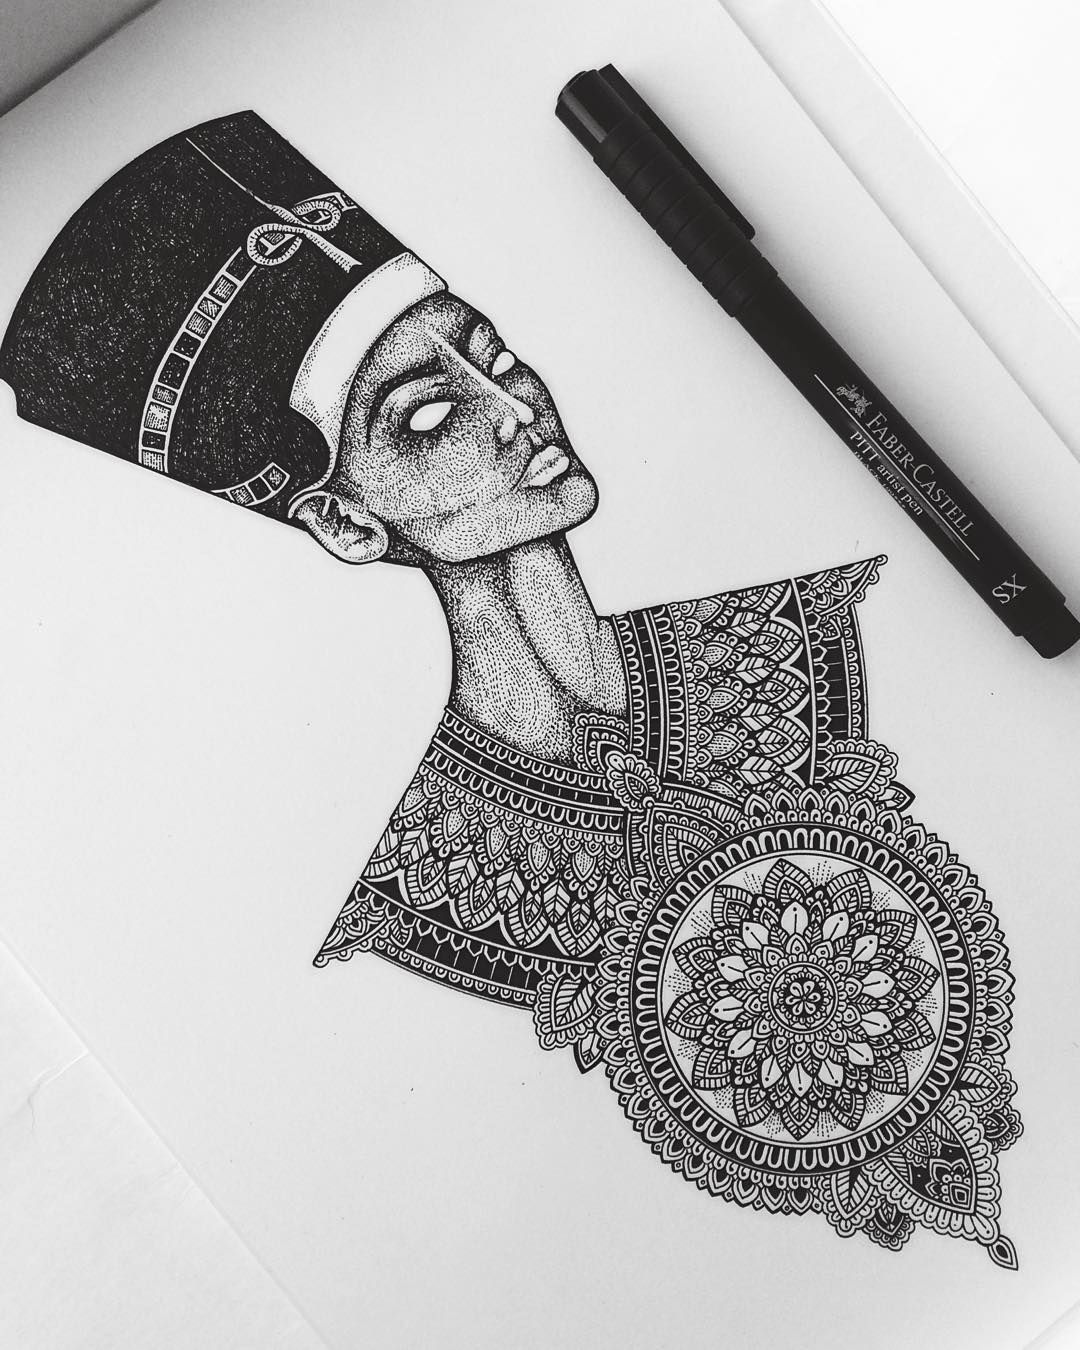 Nefertiti - Tattoos by KisaSwan on DeviantArt |Nefertiti Tattoo Drawing